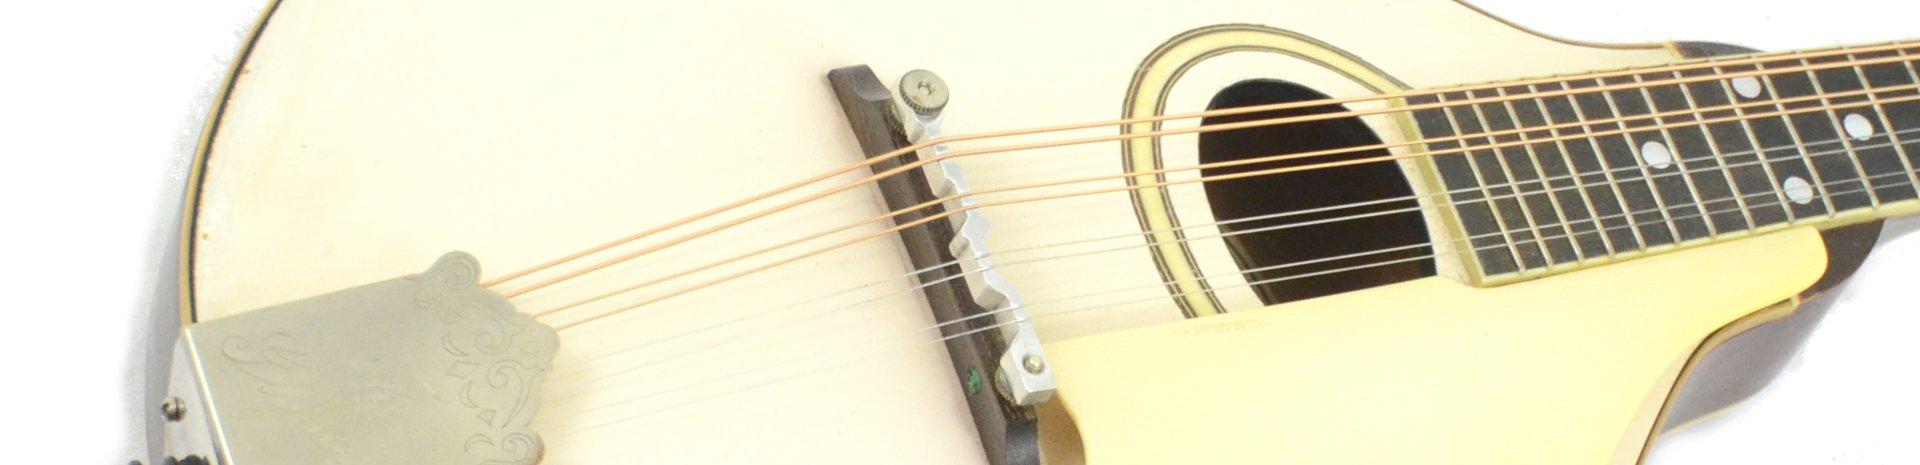 Used and Vintage Mandolin Banner